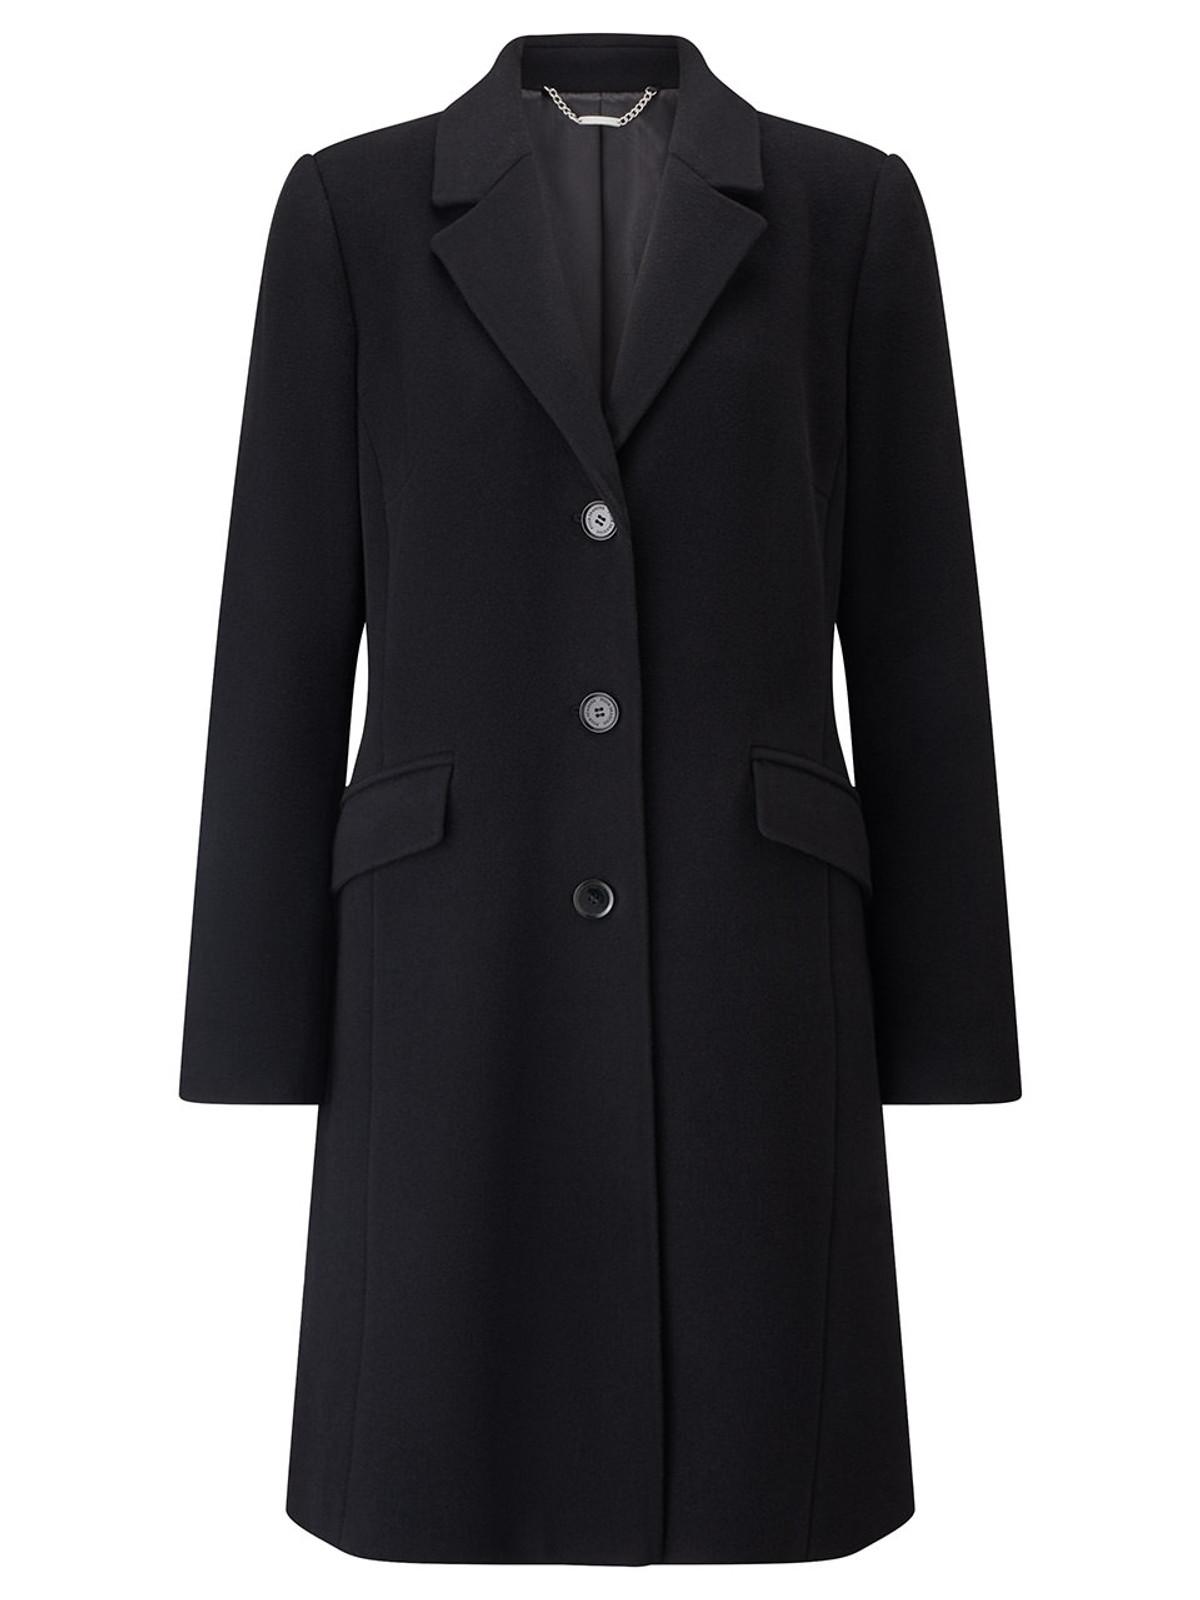 City Coat, Black